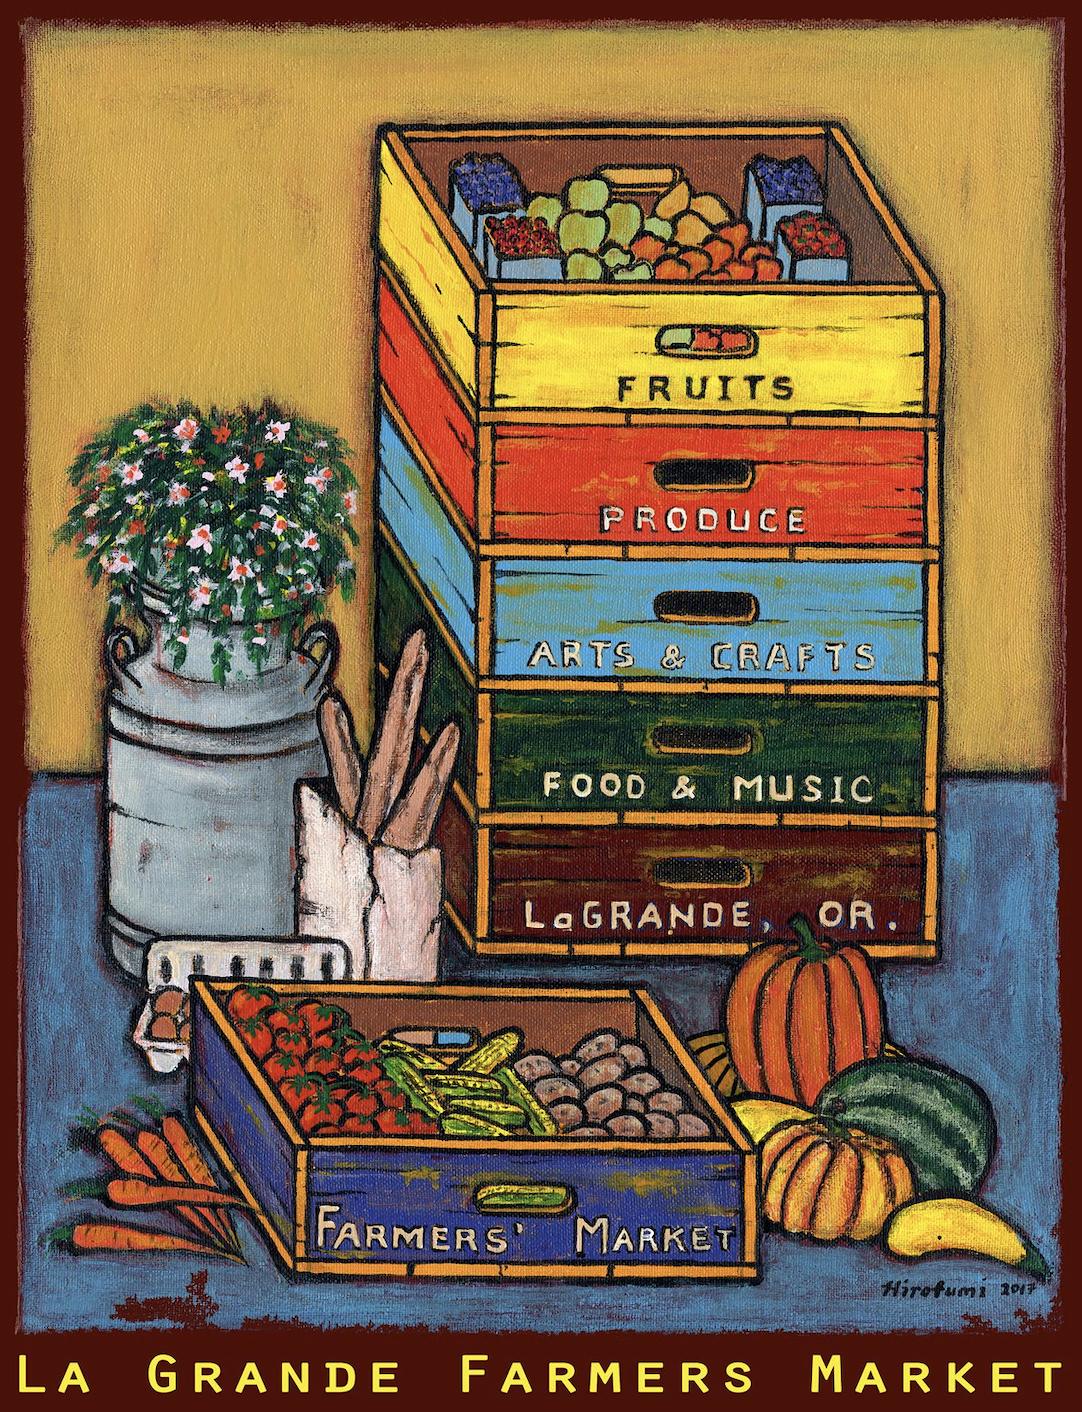 LG Farmers Market 2018 poster art